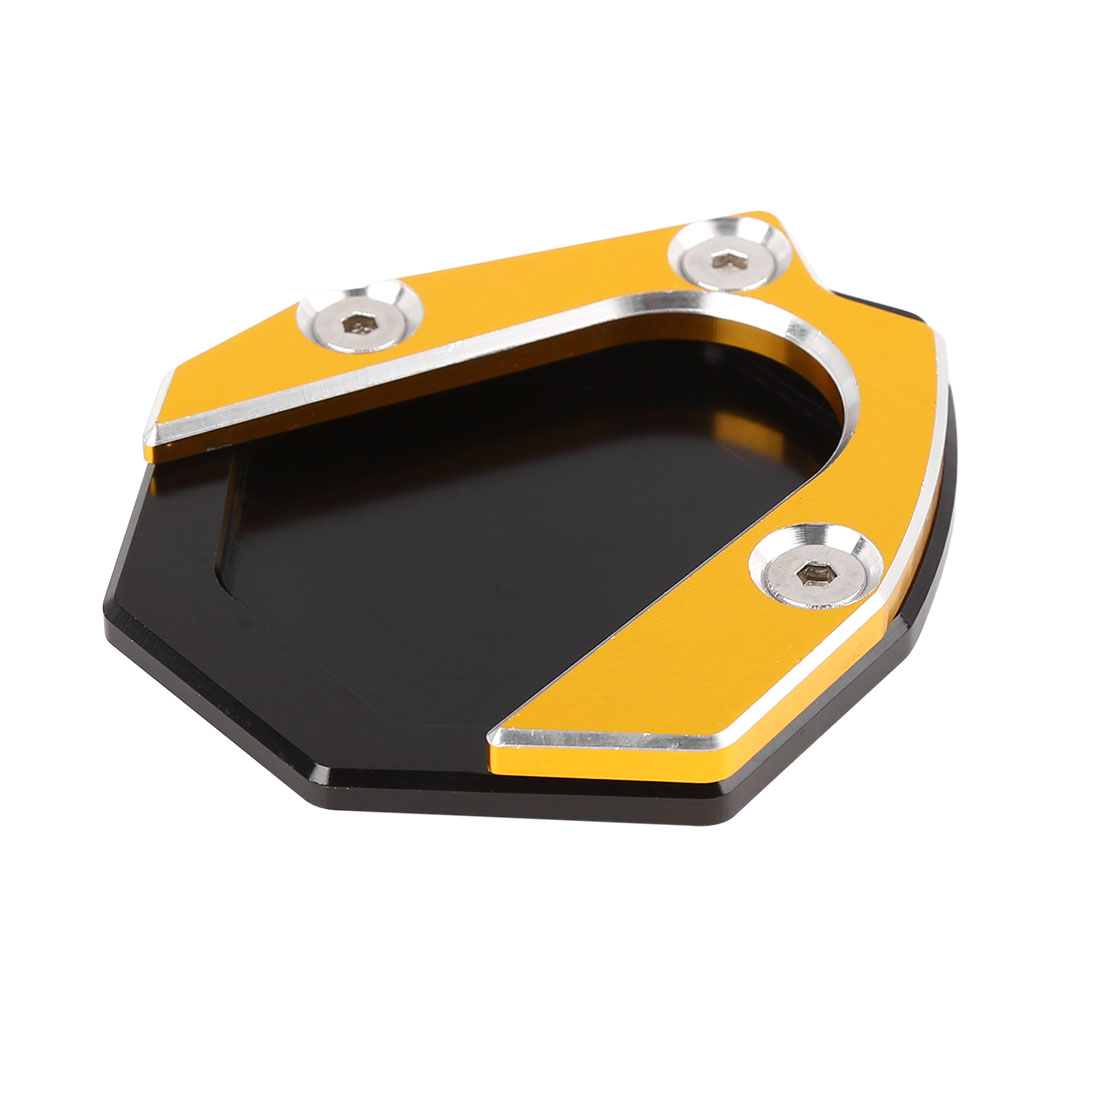 Black Gold Tone Aluminium Alloy Antislip Kickstand Enlarger Pad for Benelli 500